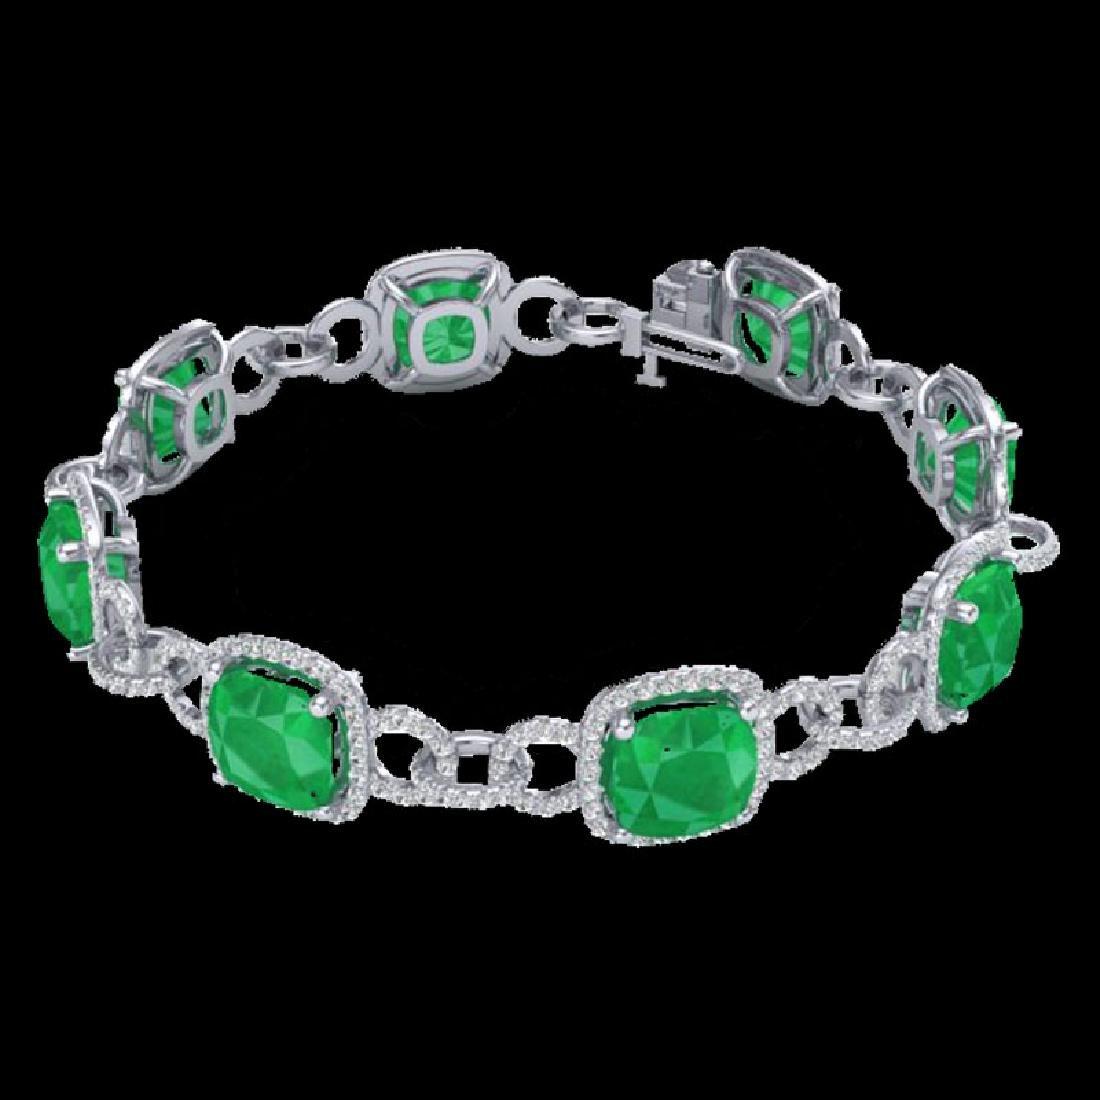 25 CTW Emerald & Micro VS/SI Diamond Bracelet 14K White - 2